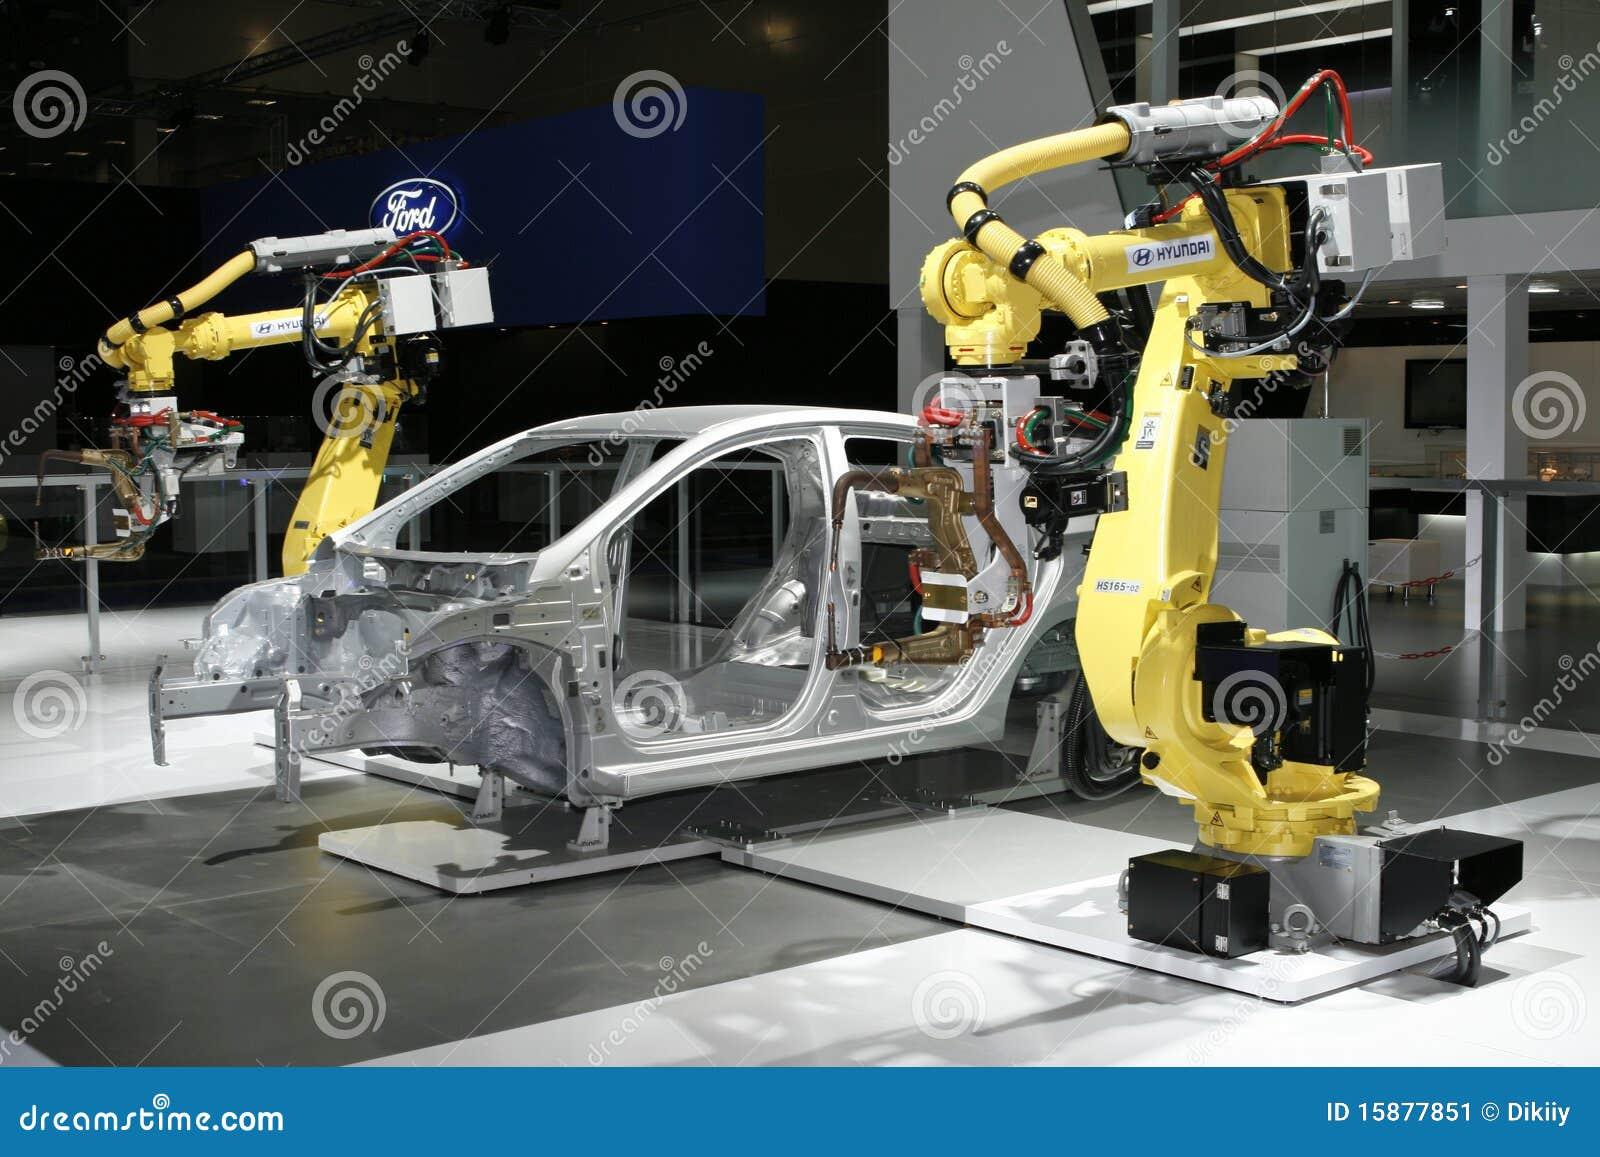 Hyundai Industrial Robots For Welding amp Handling Editorial